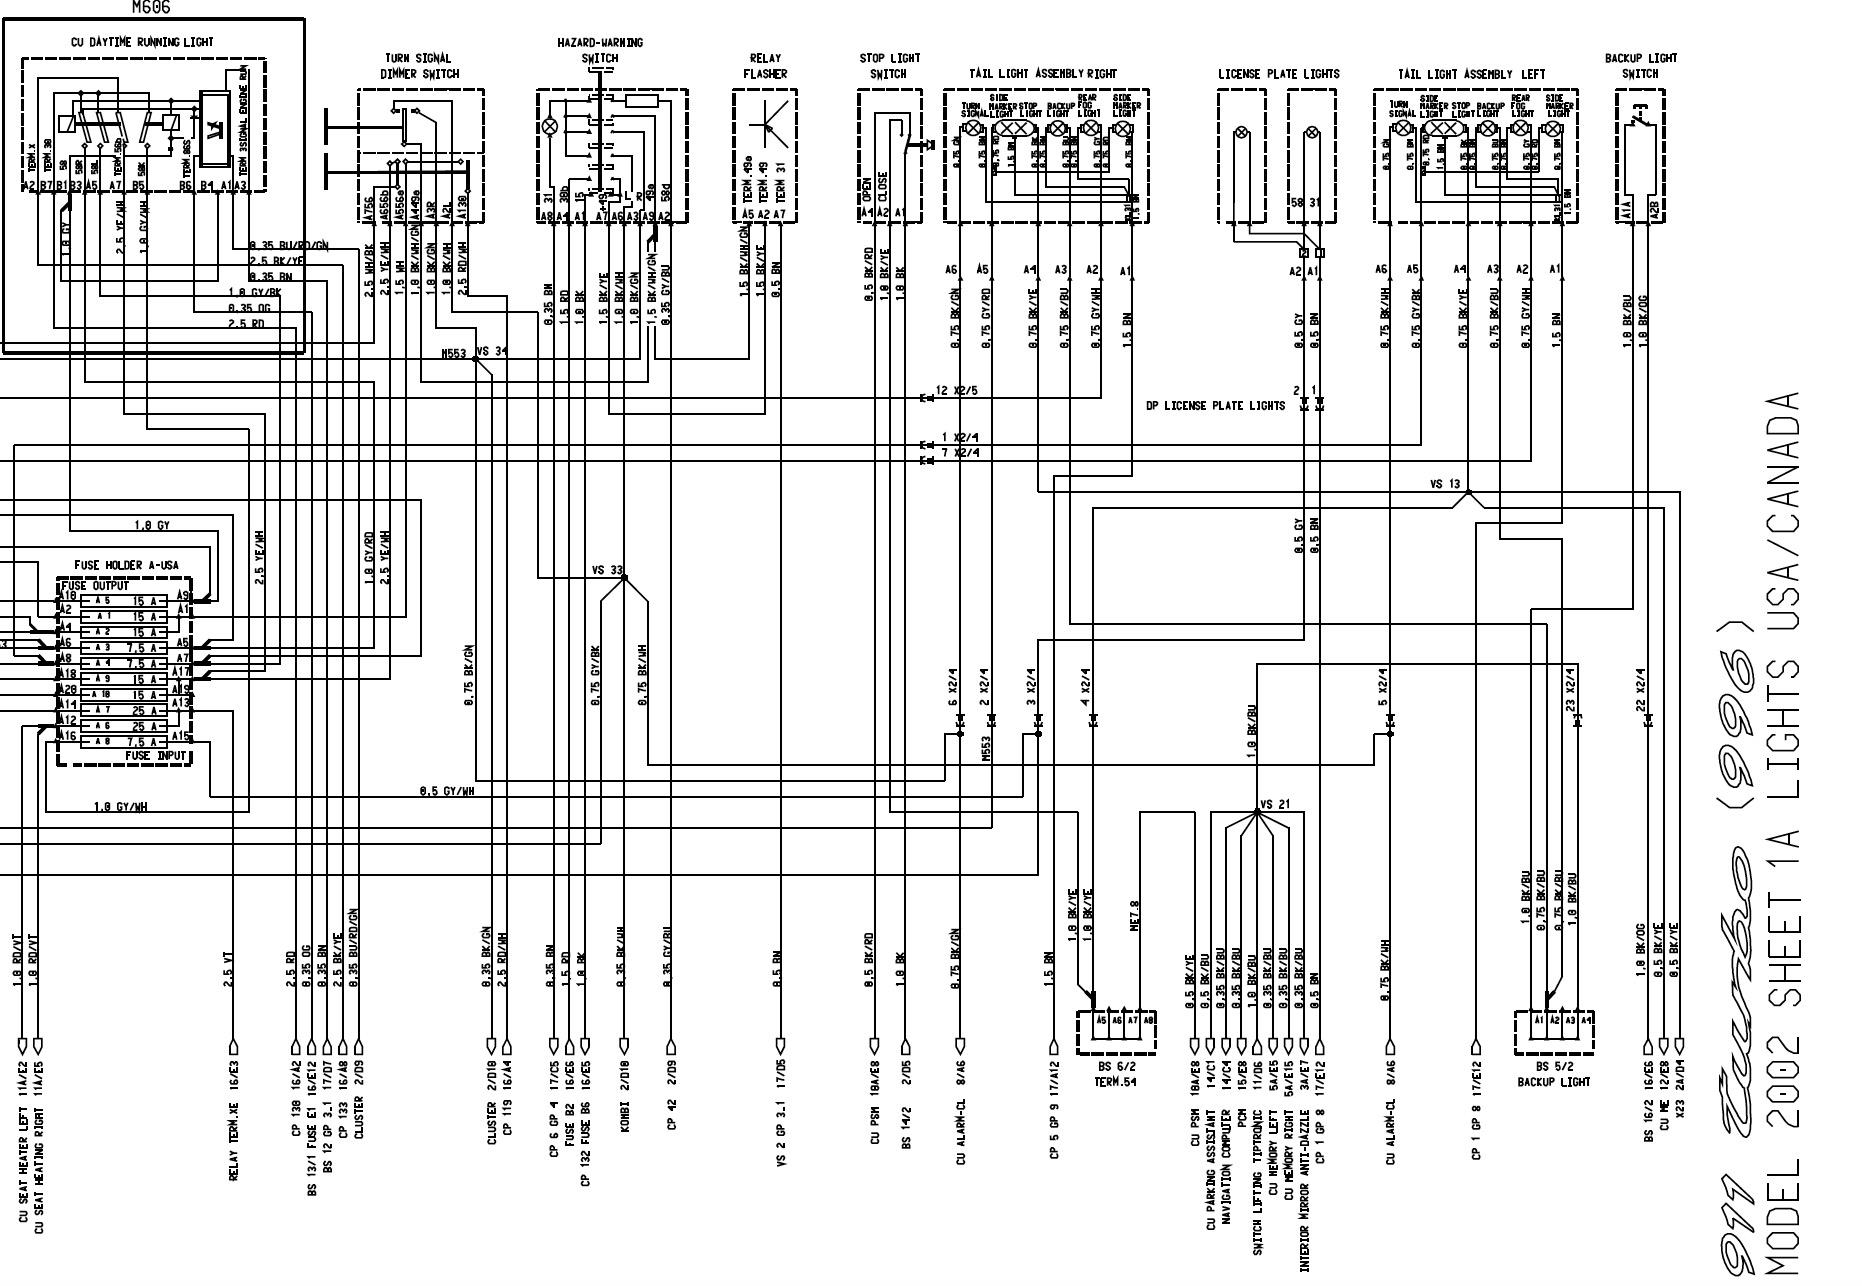 dana cruise wiring diagram jeep xj engine diagram vw beetle 1979 Ford Dana Cruise Control Wiring Diagram  Cruise Control Module Ford Ranger Cruise Control Diagram 1991 Dodge W250 Wiring-Diagram